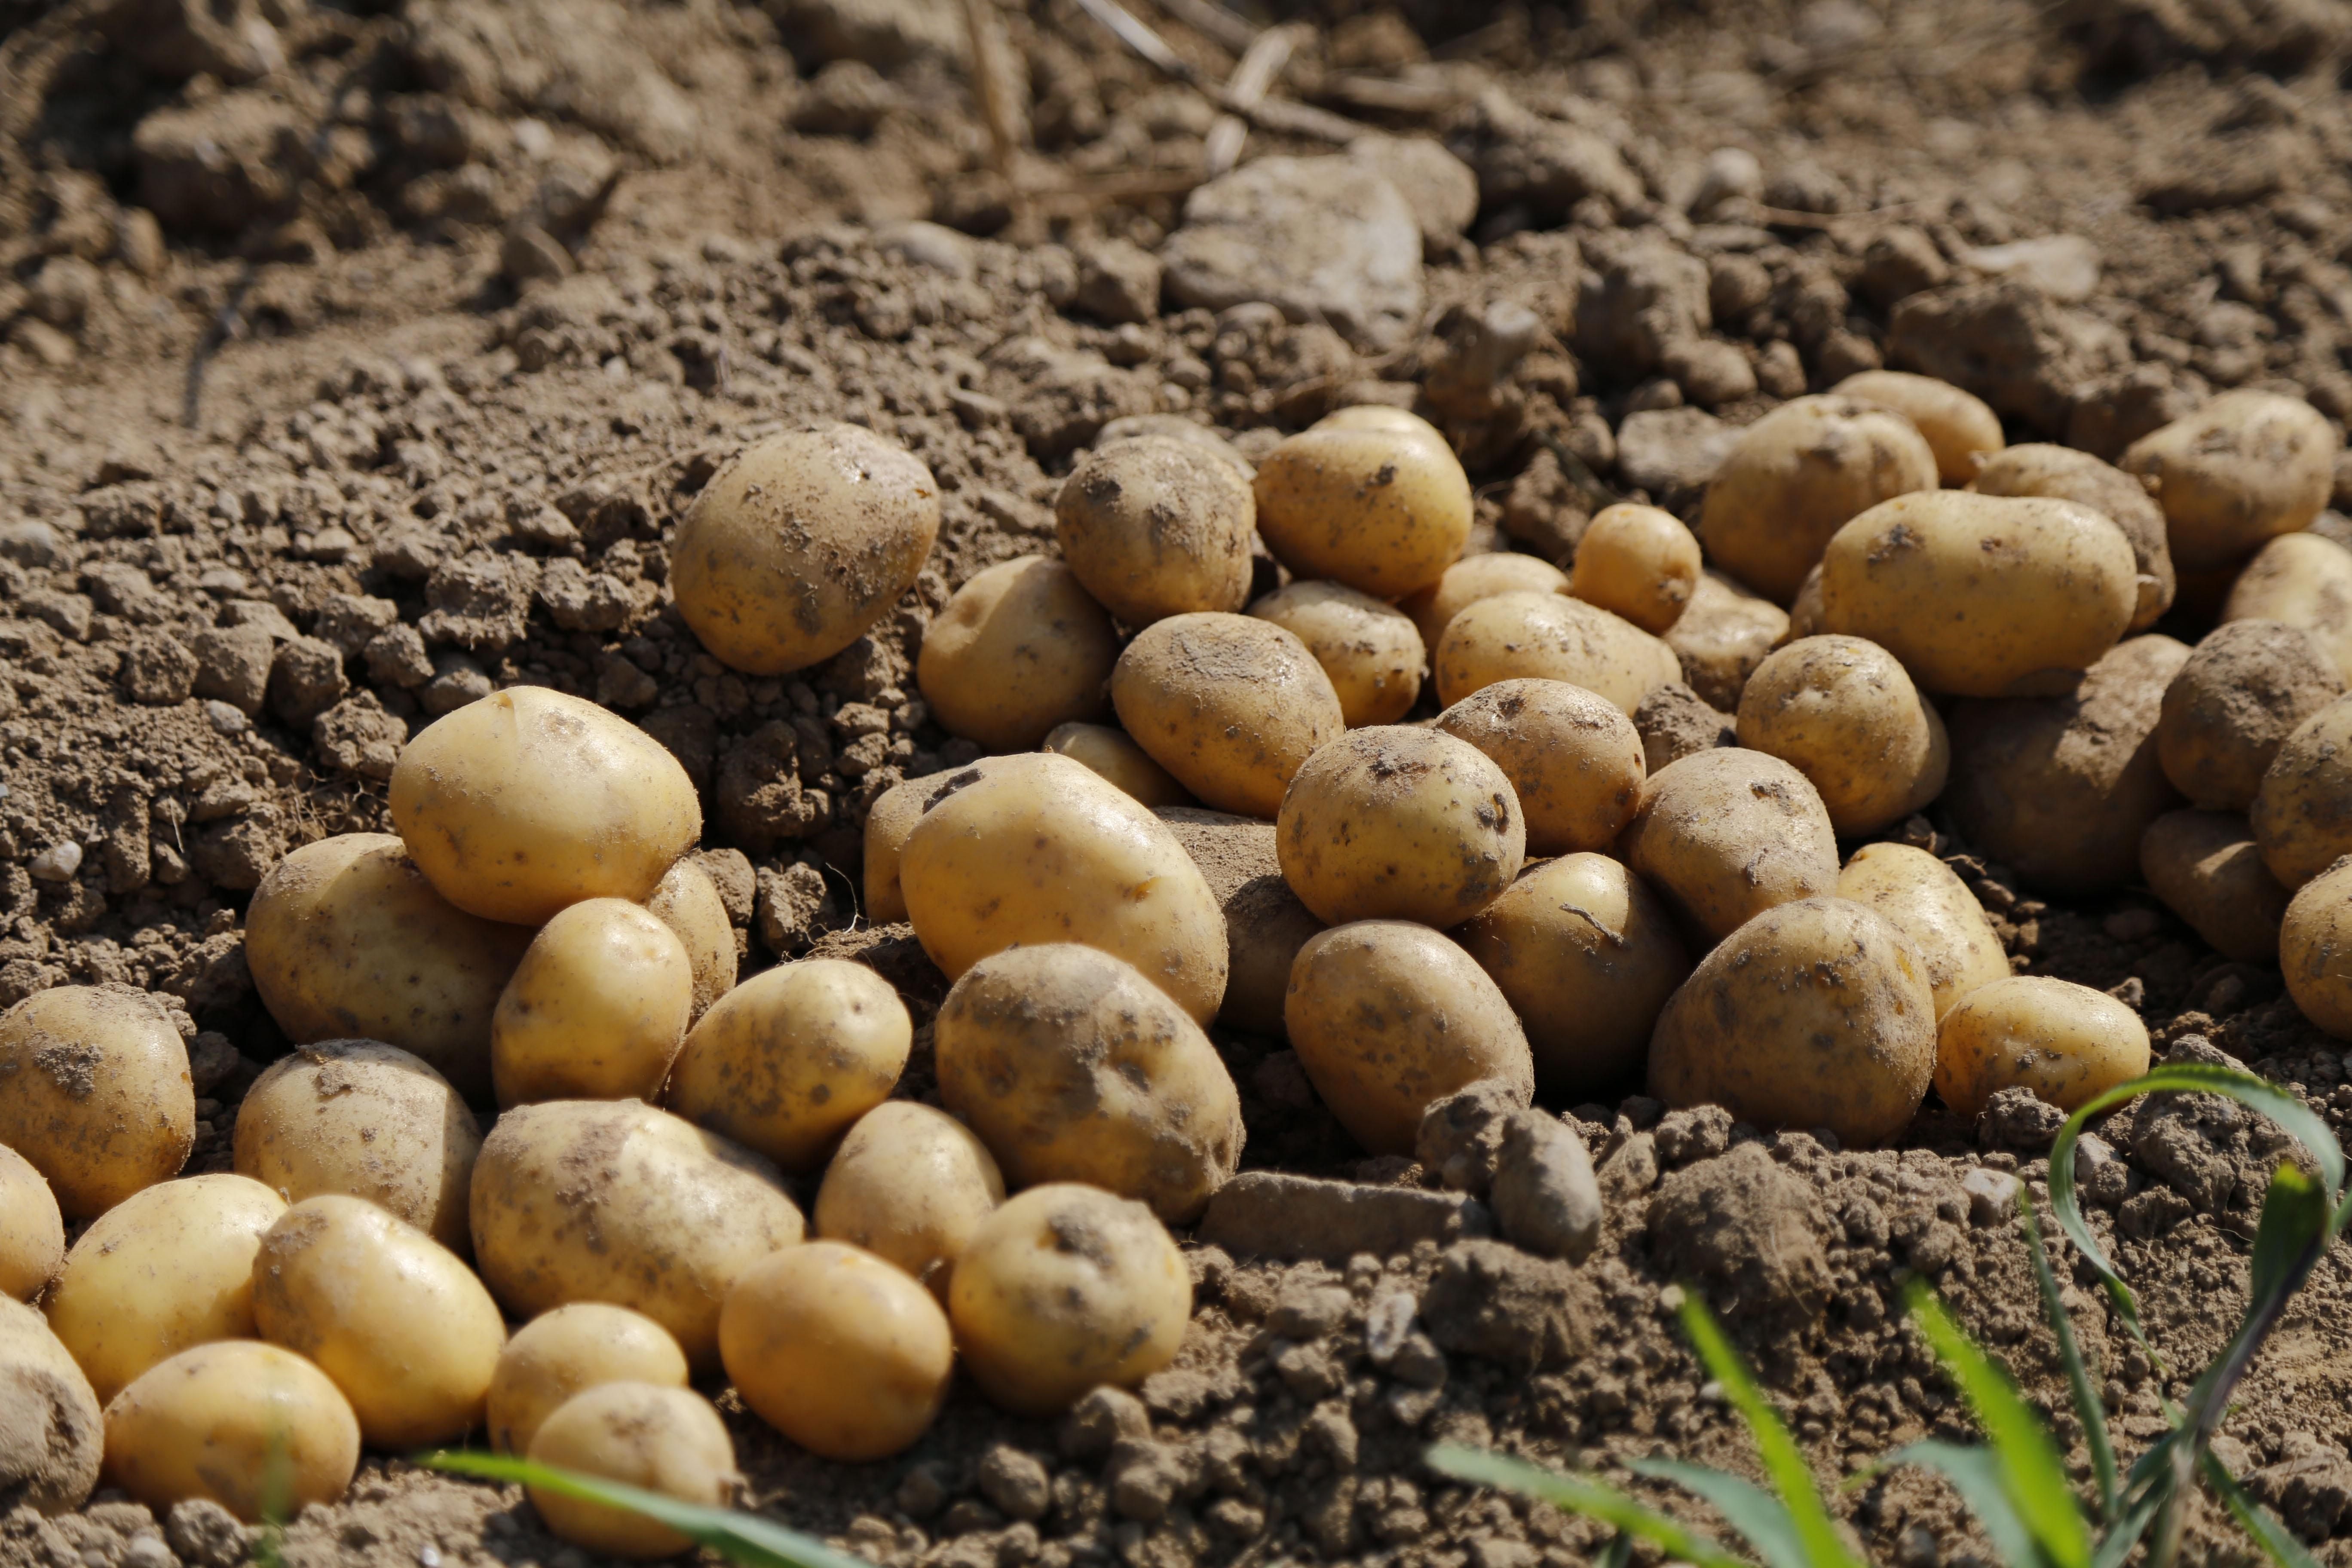 Картошка в земле картинки